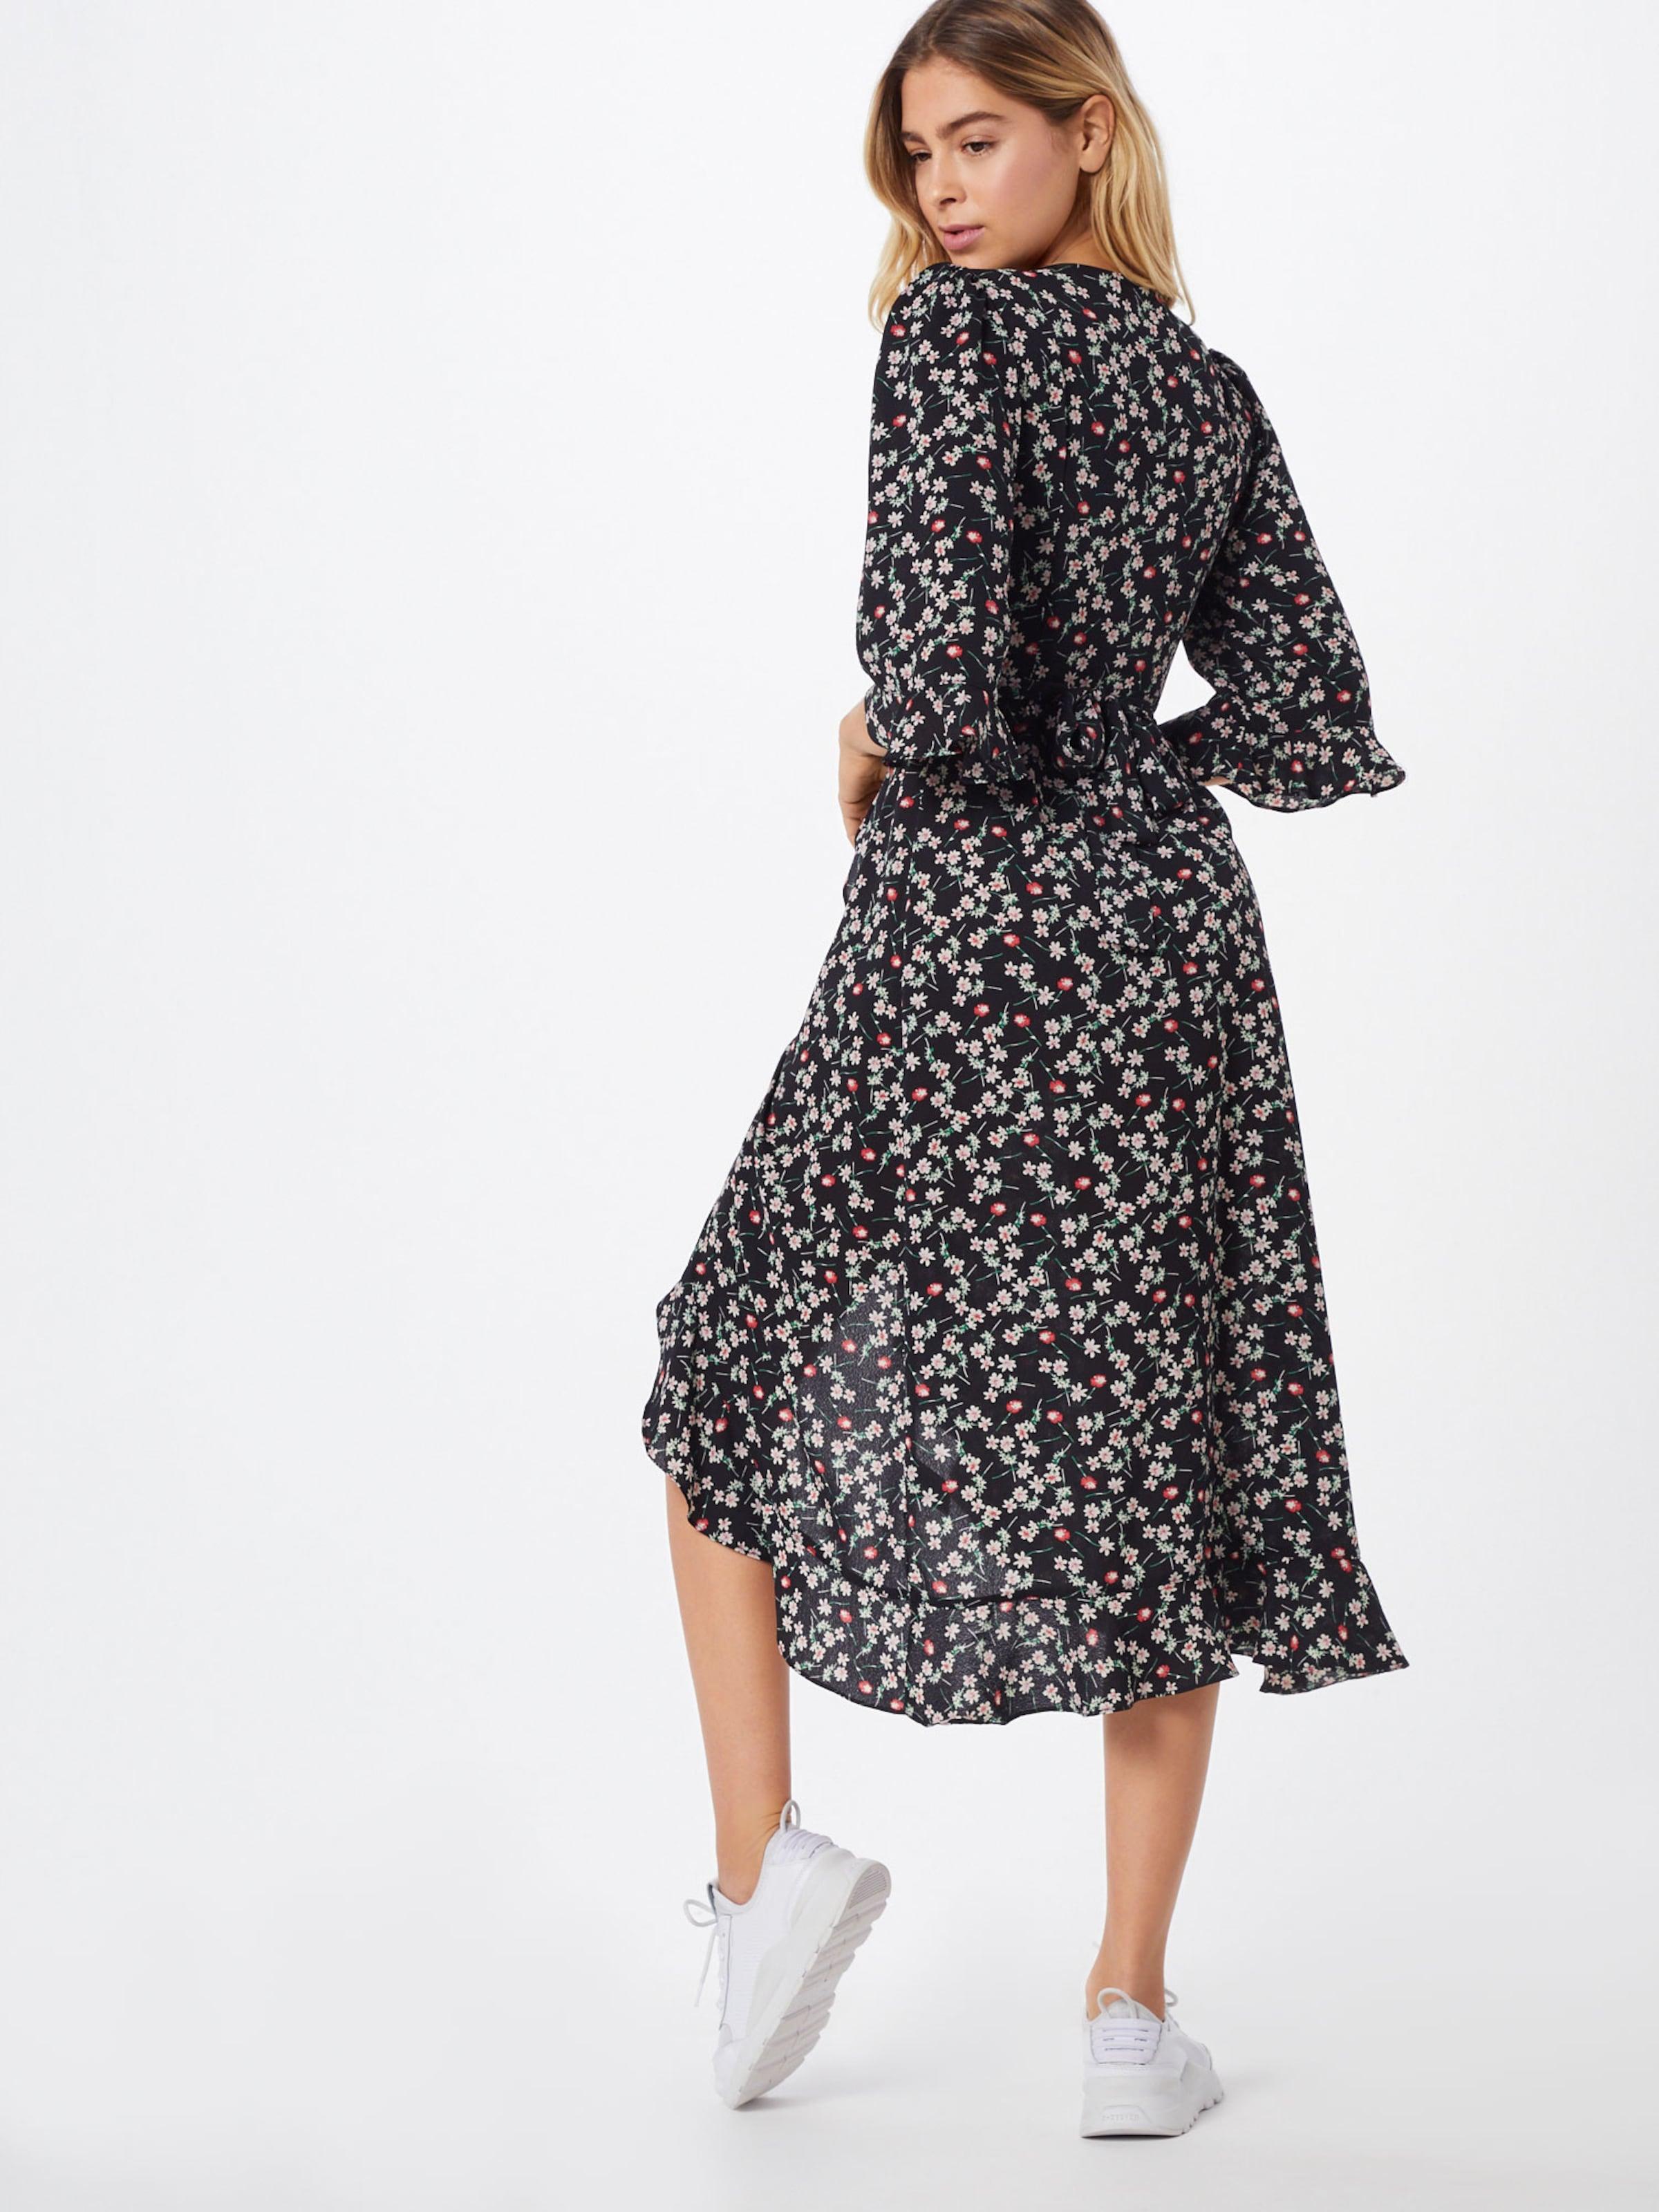 NoirBlanc En Robe 'vic' Fashion Union 8mNvnwy0OP